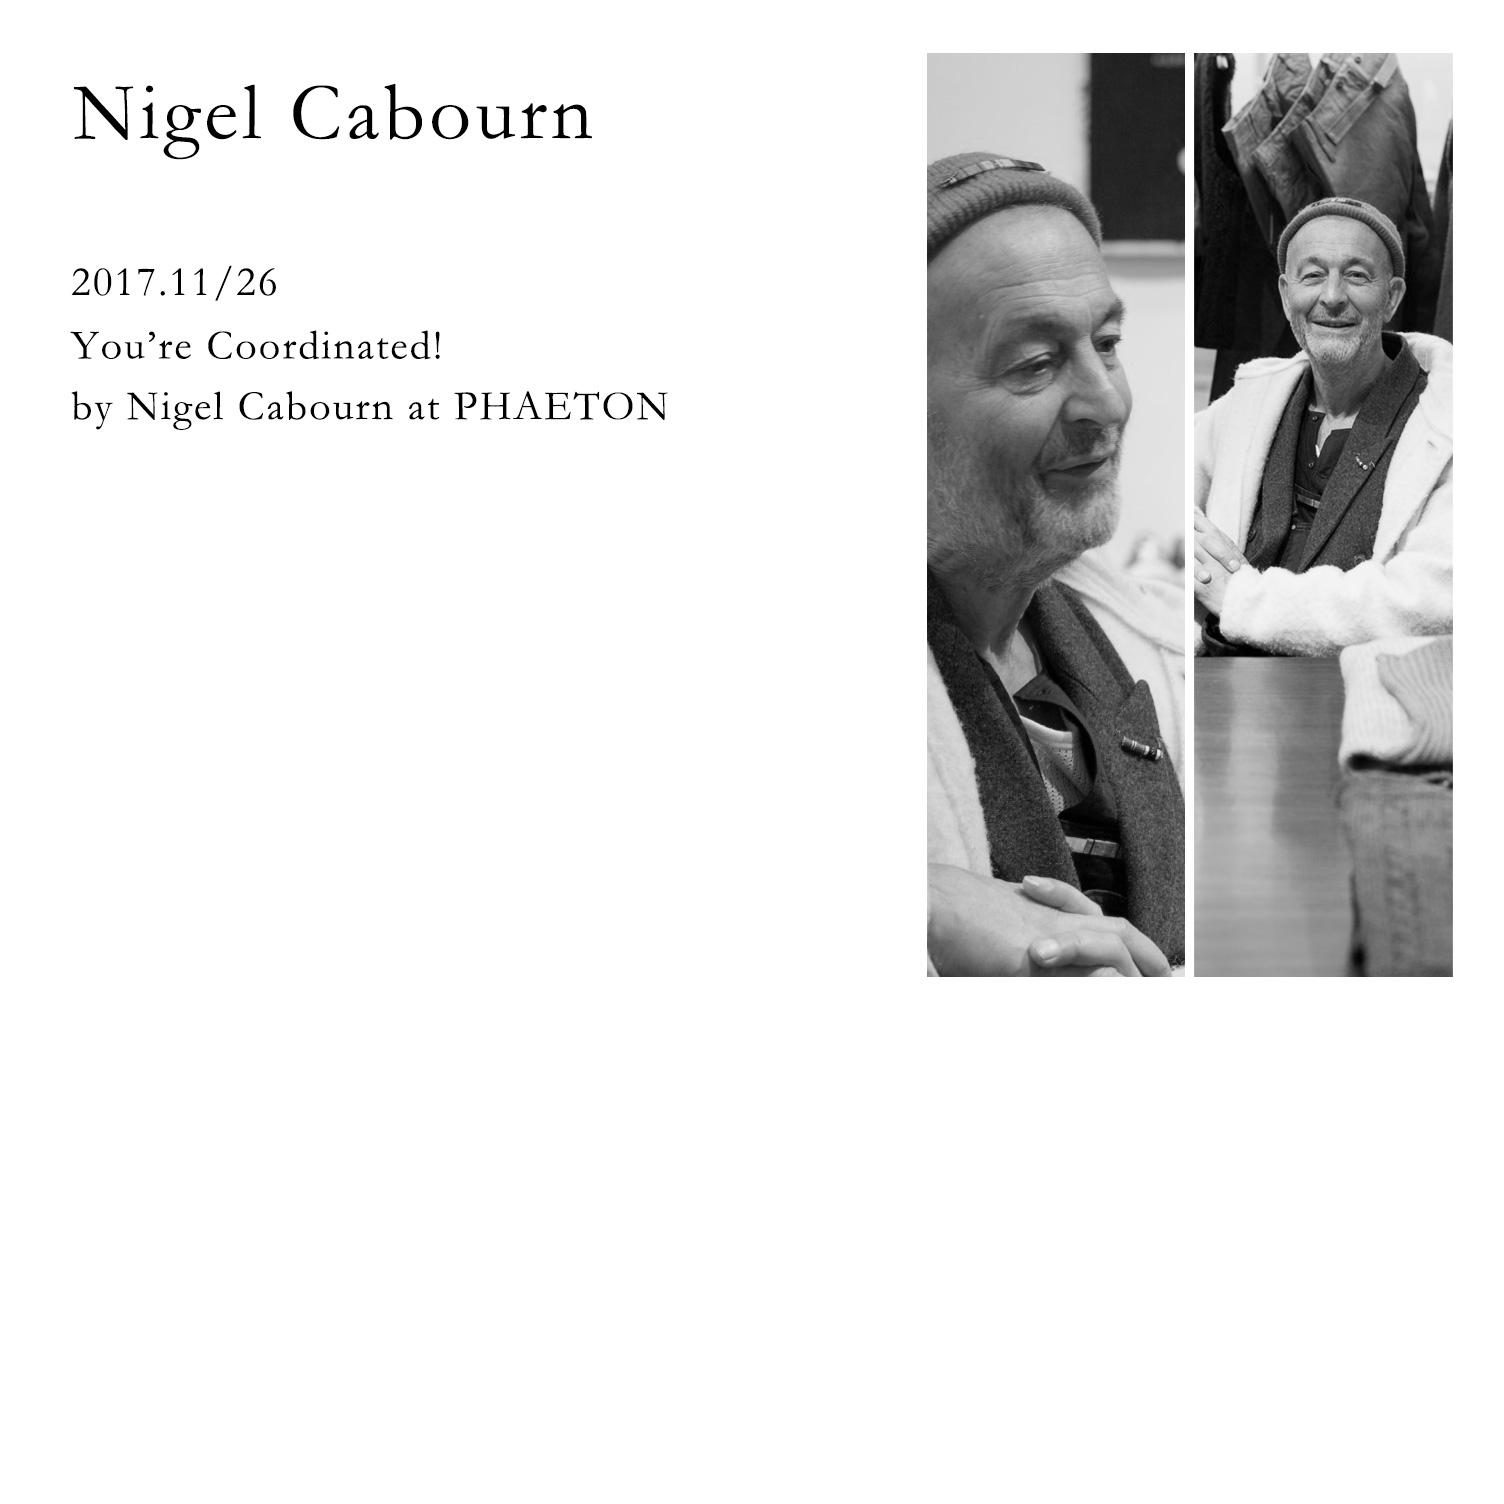 15e5a1013695 Nigel Cabourn. 2017年11月26日、ナイジェルケーボン氏の来店イベントをPHAETONにて開催しました。当日は通常営業の中、ナイジェル氏(デザイナー本人)がお客様一人  ...